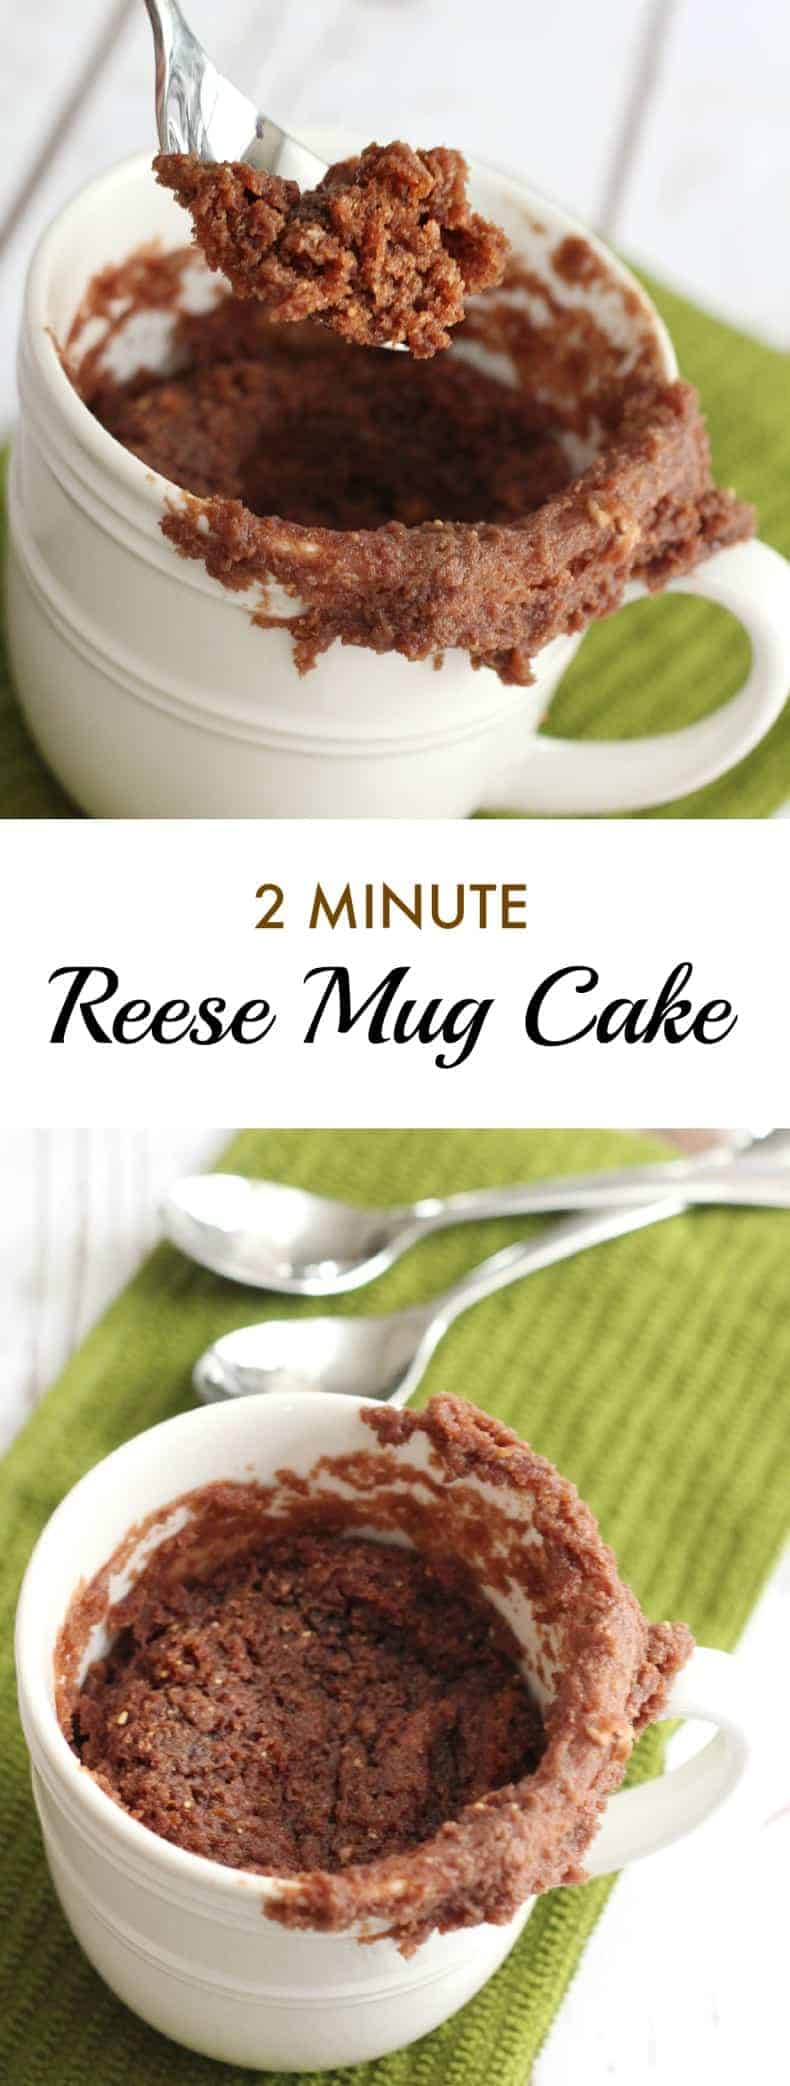 reese mug cake recipe